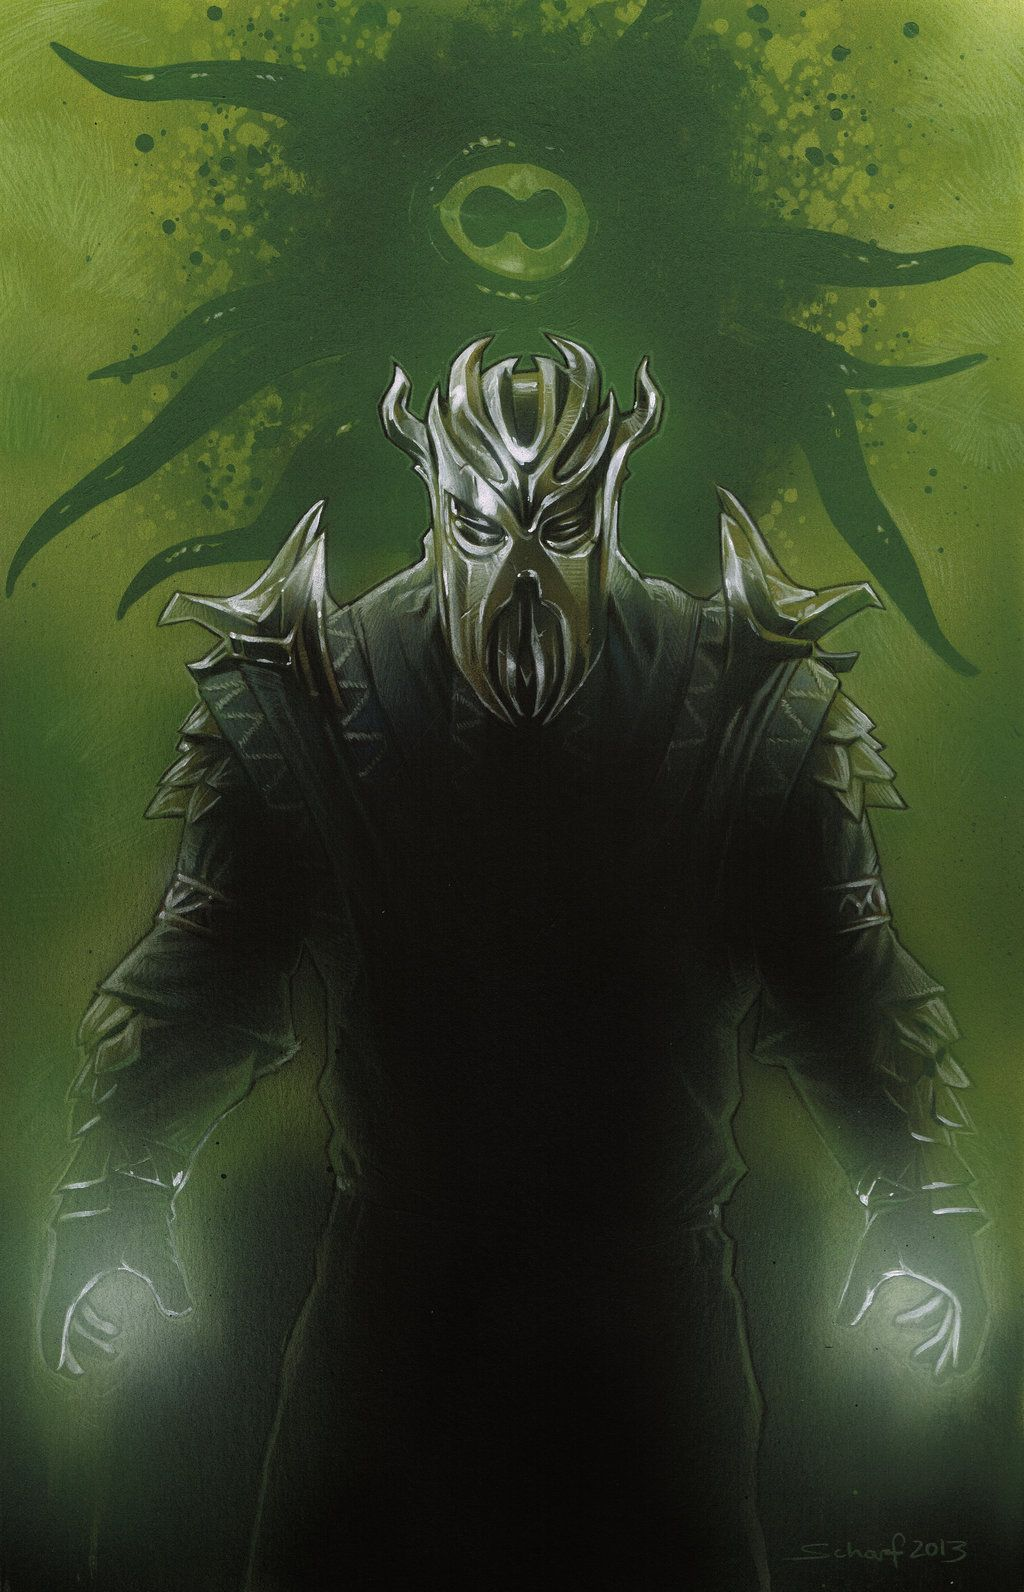 The first Dragonborn by jones4rt deviantart com - Miraak Dragonborn